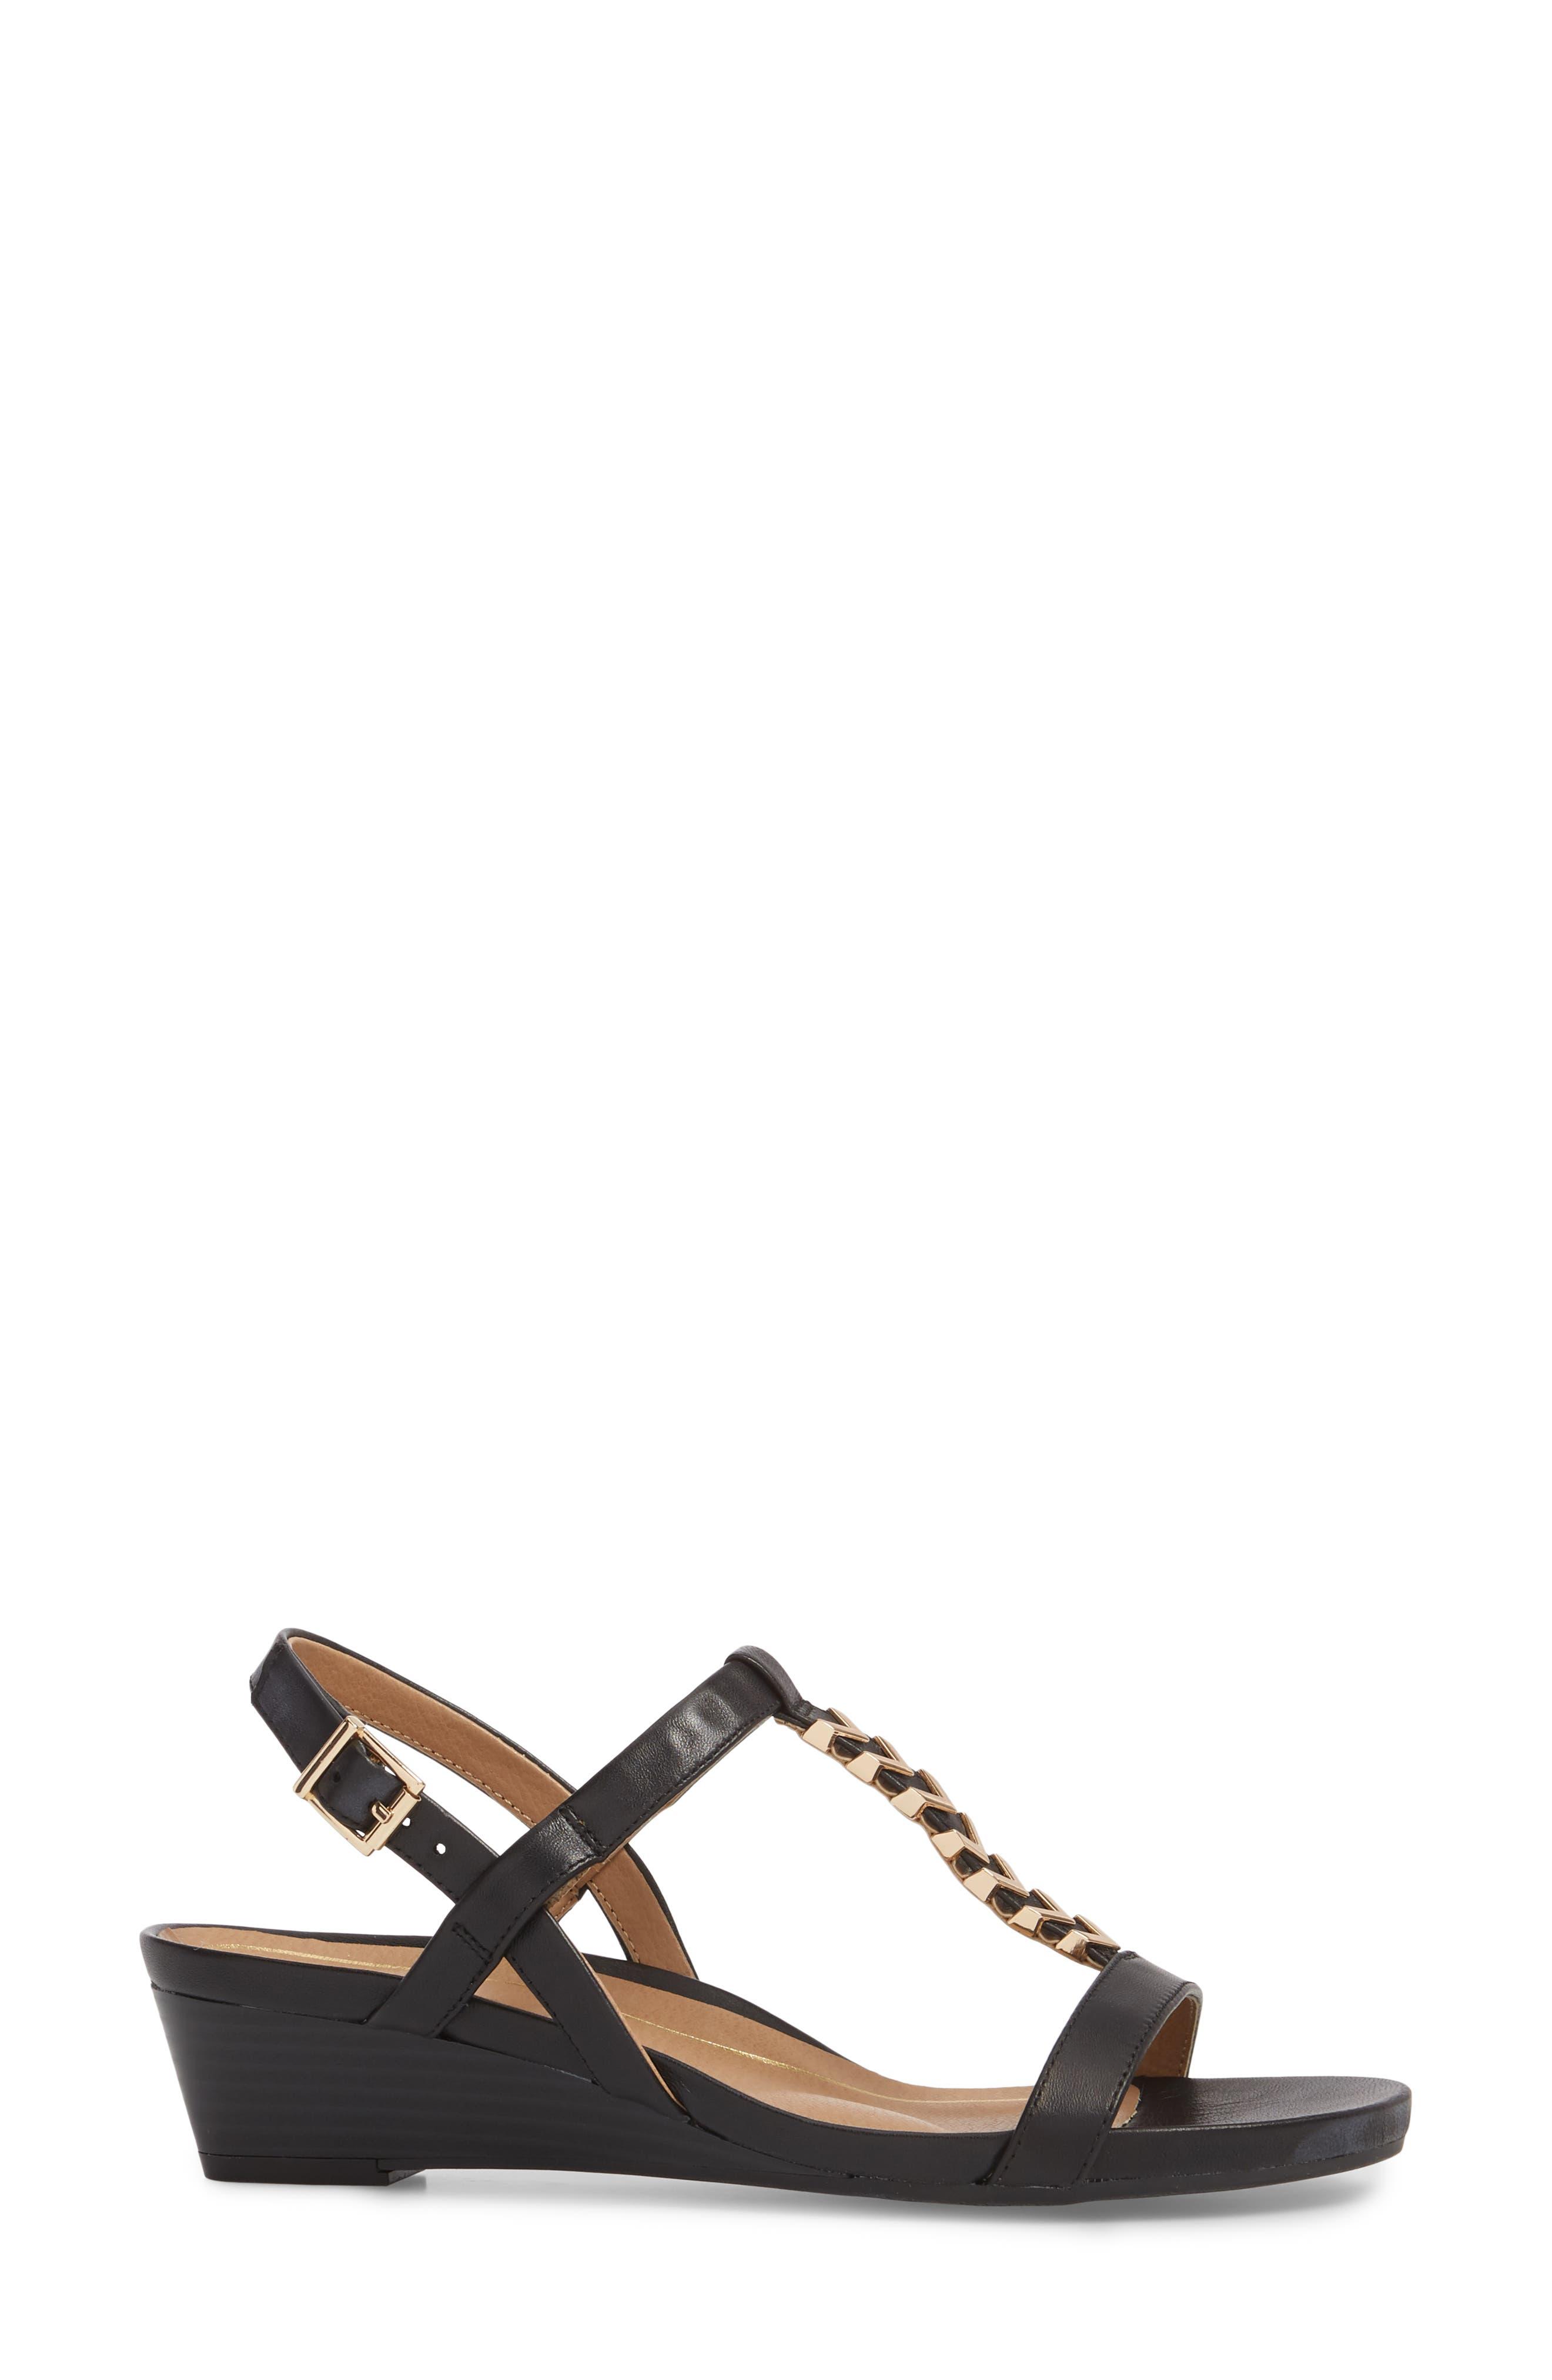 VIONIC,                             Cali T-Strap Wedge Sandal,                             Alternate thumbnail 3, color,                             001